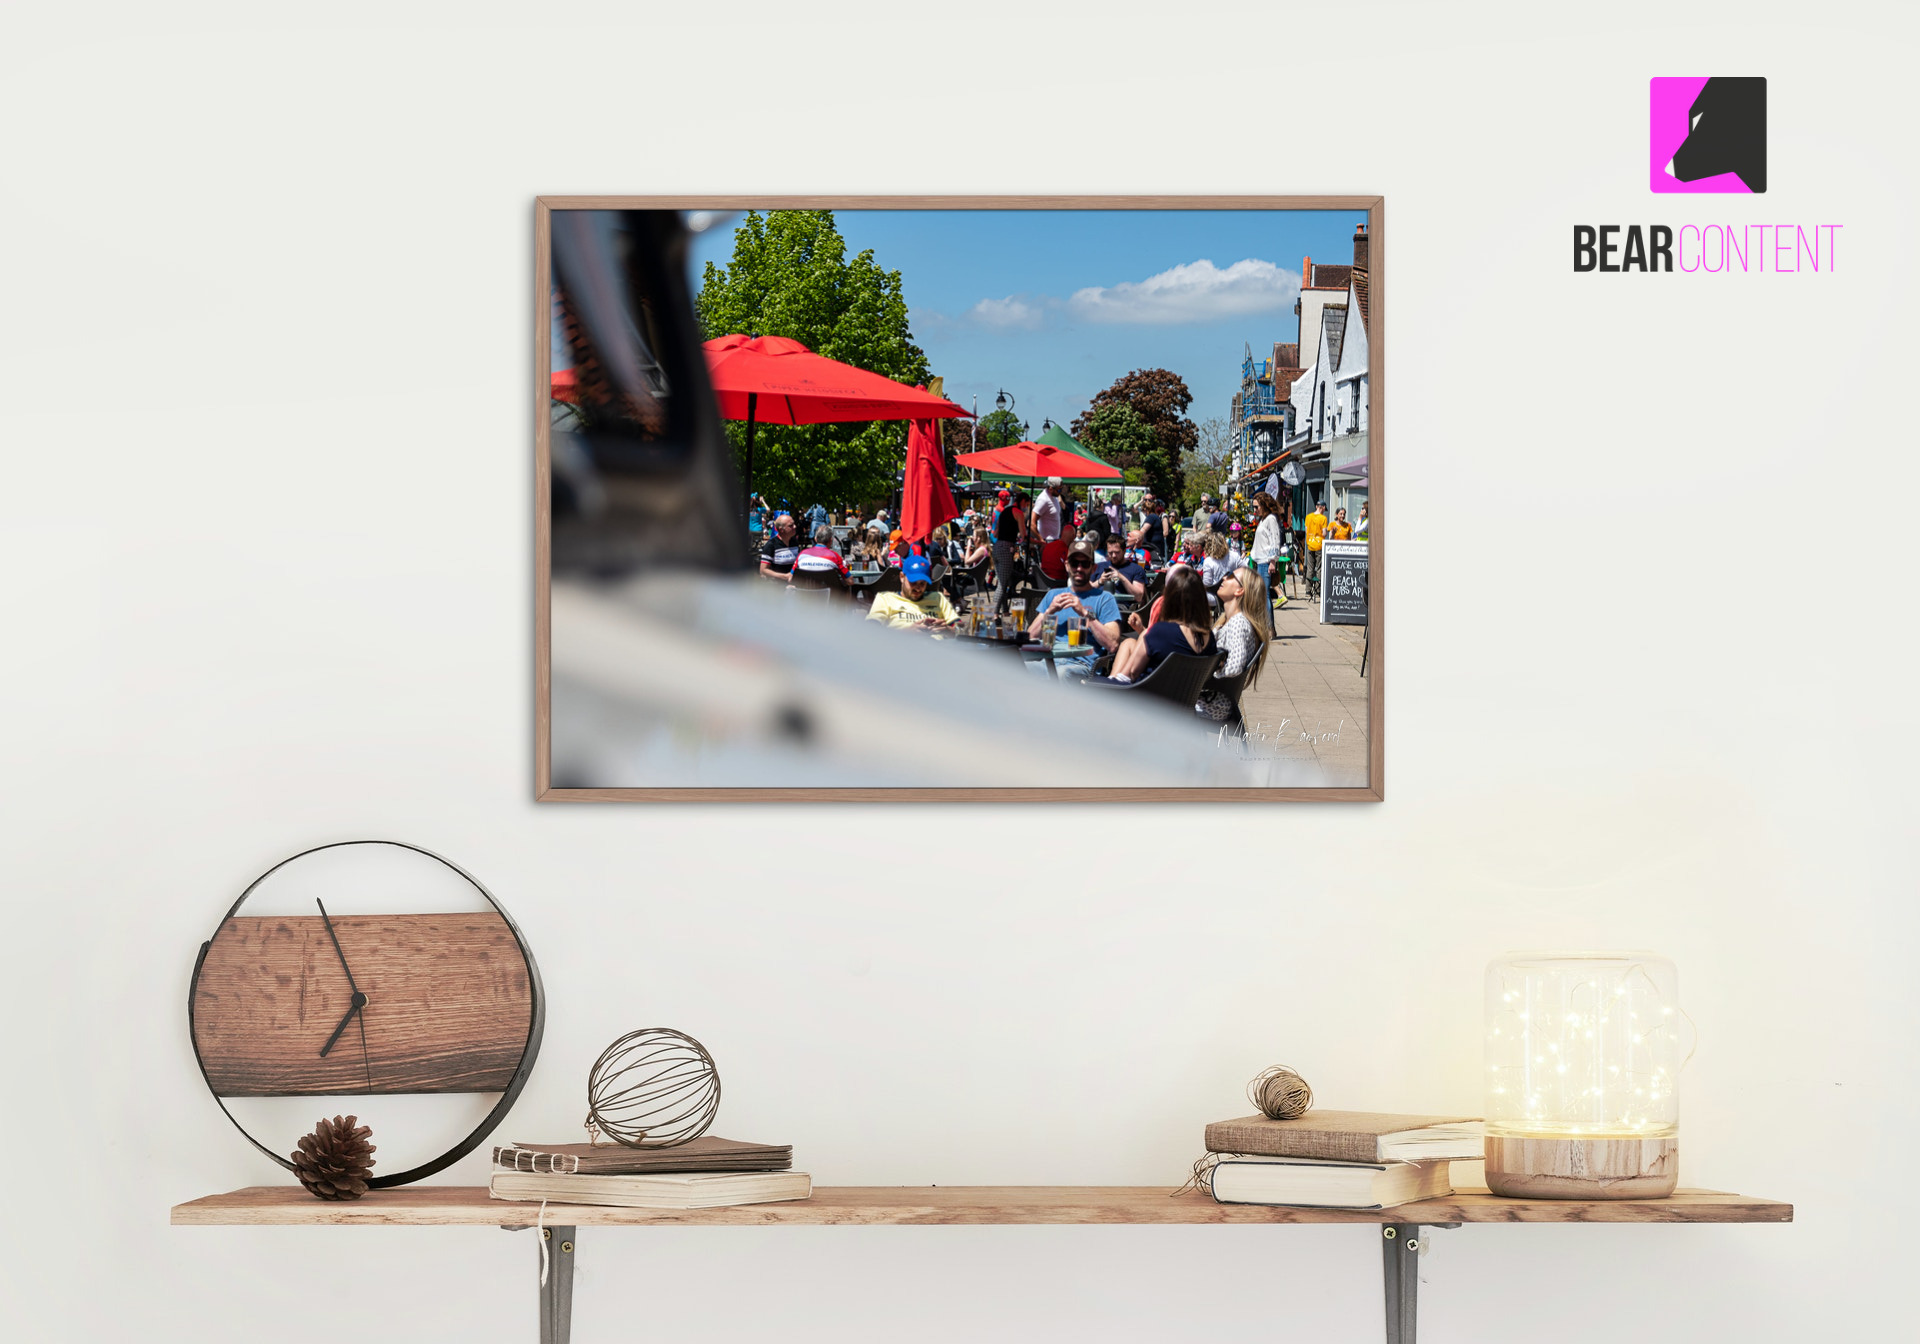 High Street Festival Event Photography